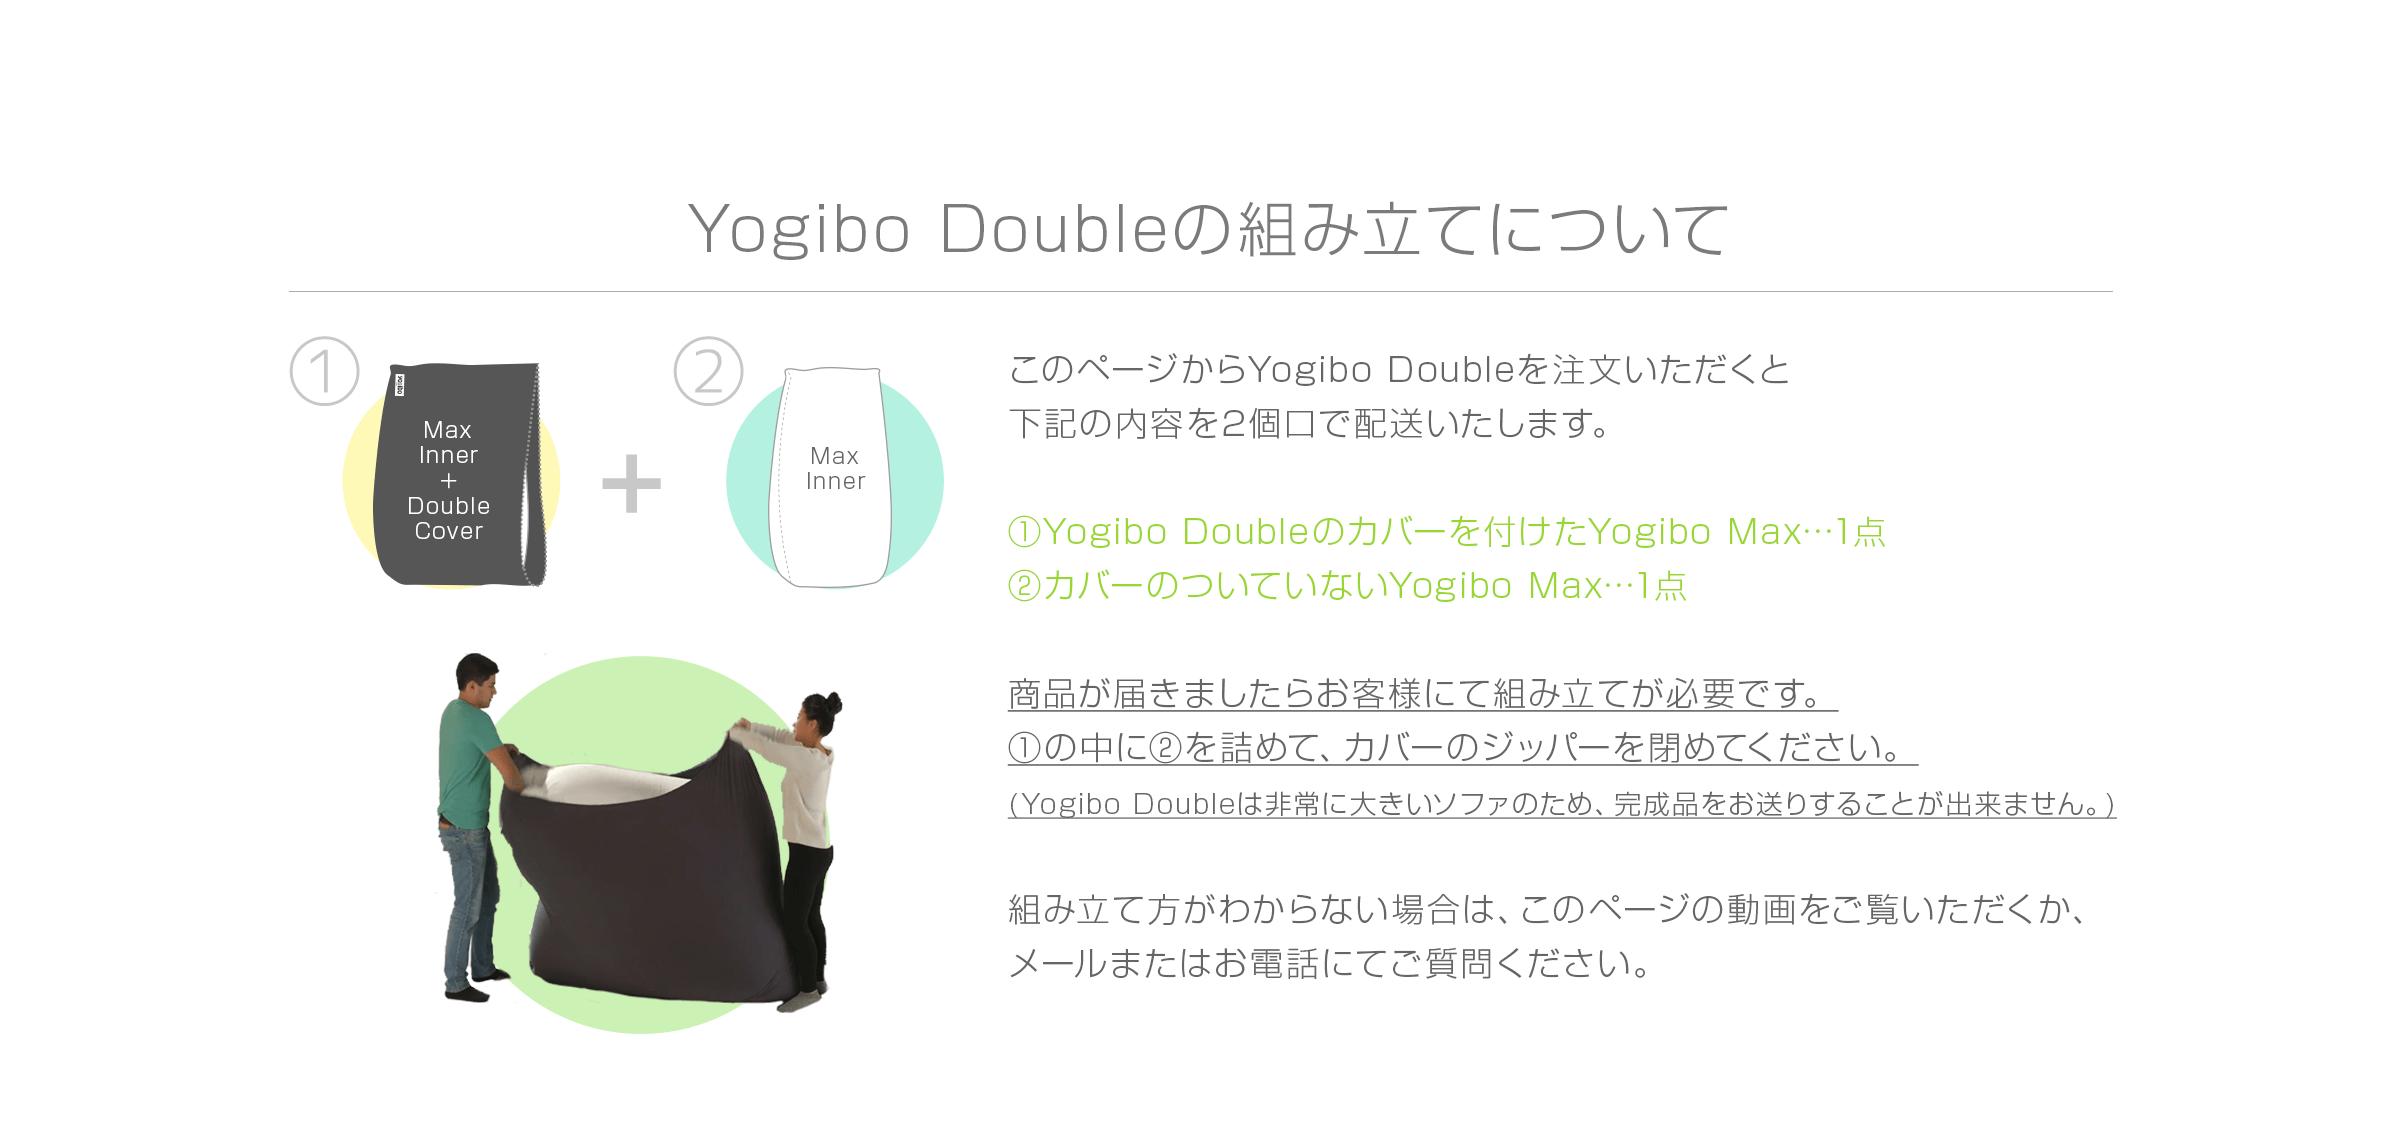 Yogibo Doubleのビーズソファはお客様にて組み立てが必要です。